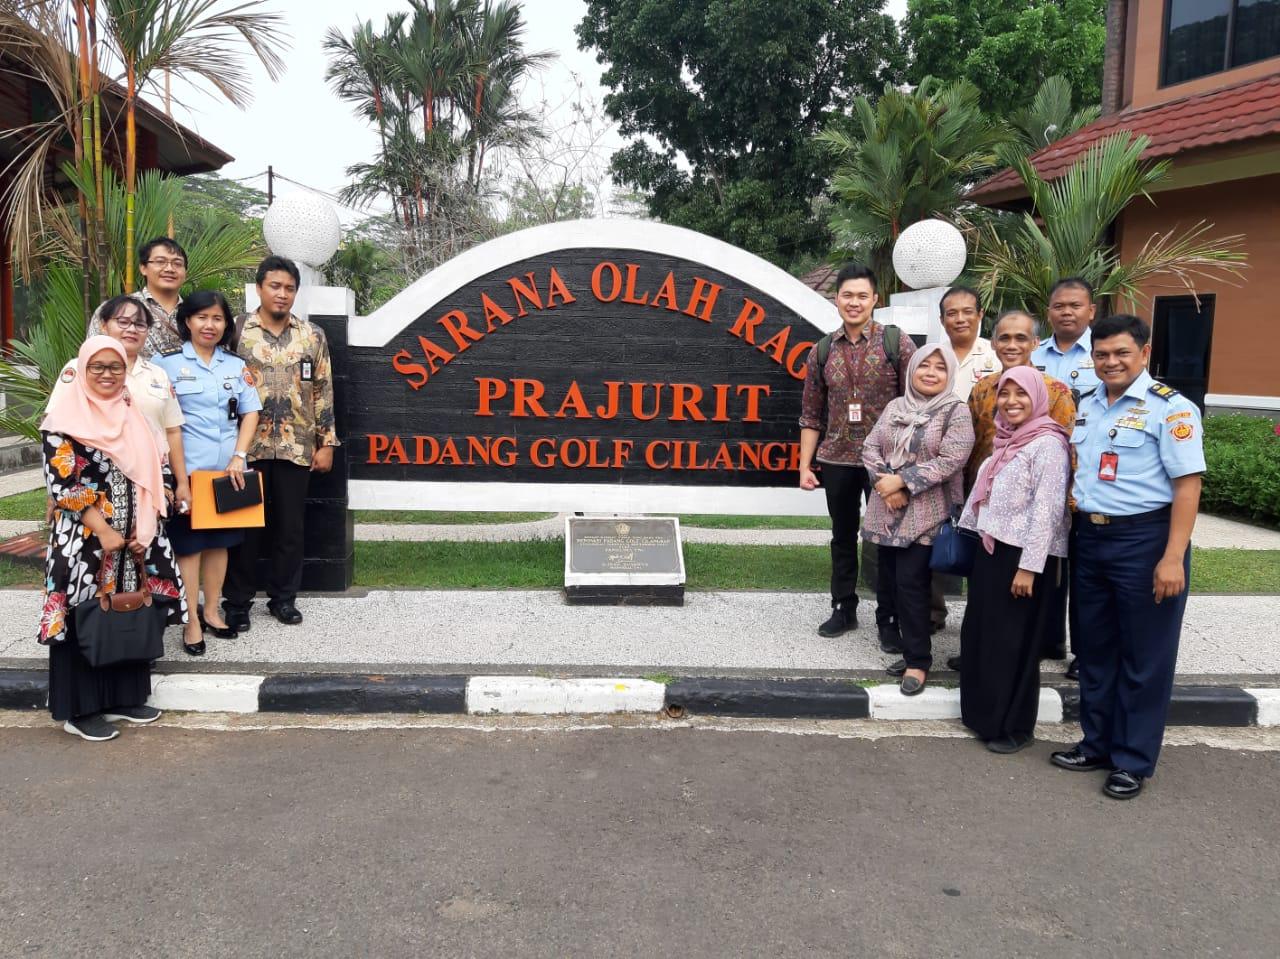 Pemantauan Pemanfaatan BMN oleh Itjen Kemenkeu dan KPKNL Jakarta V di Lokasi Padang Golf Cilangkap, Mabes TNI